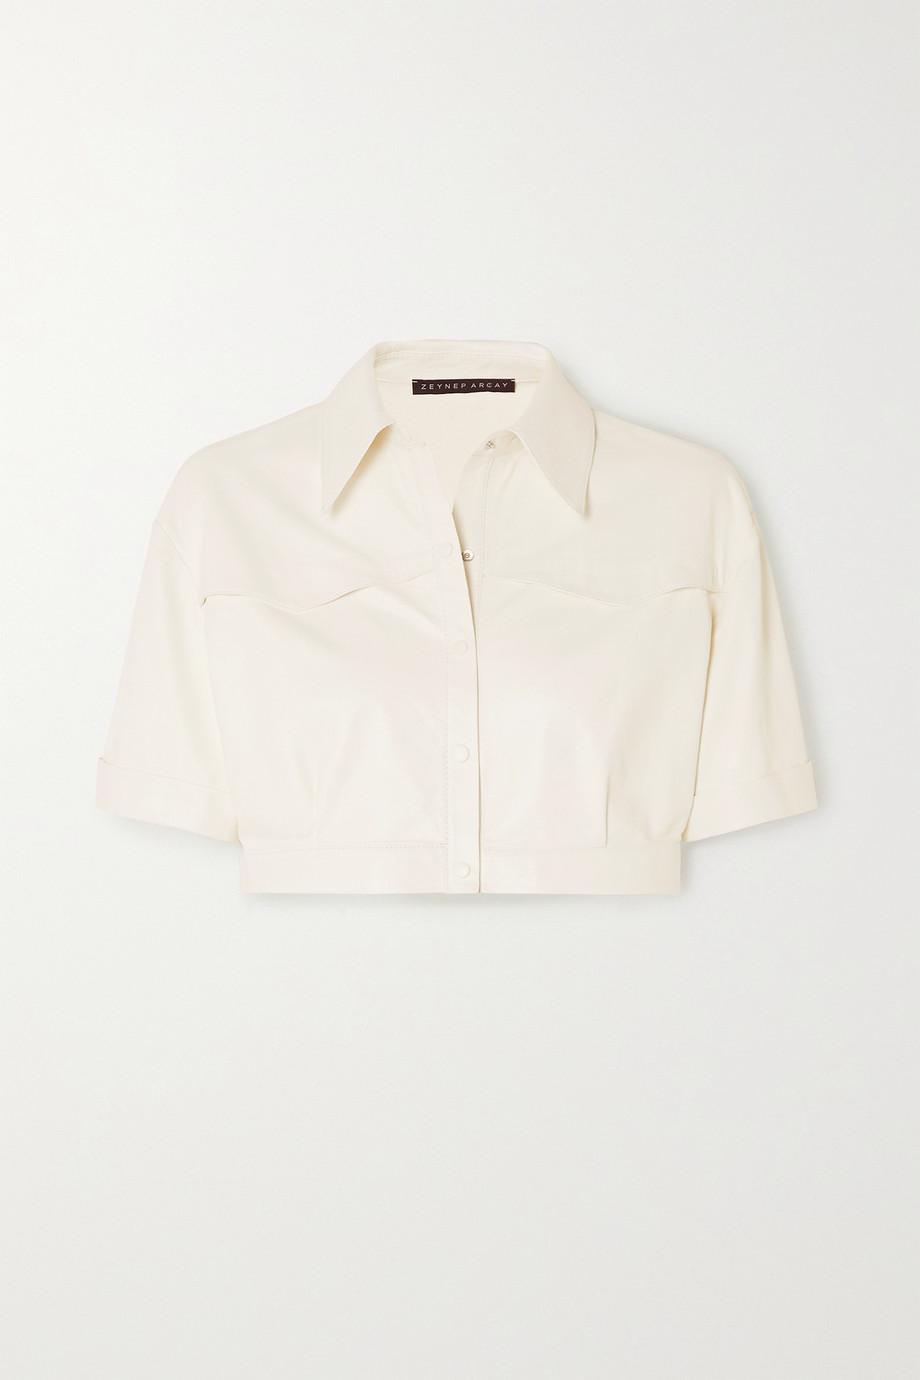 Zeynep Arcay Cropped leather shirt